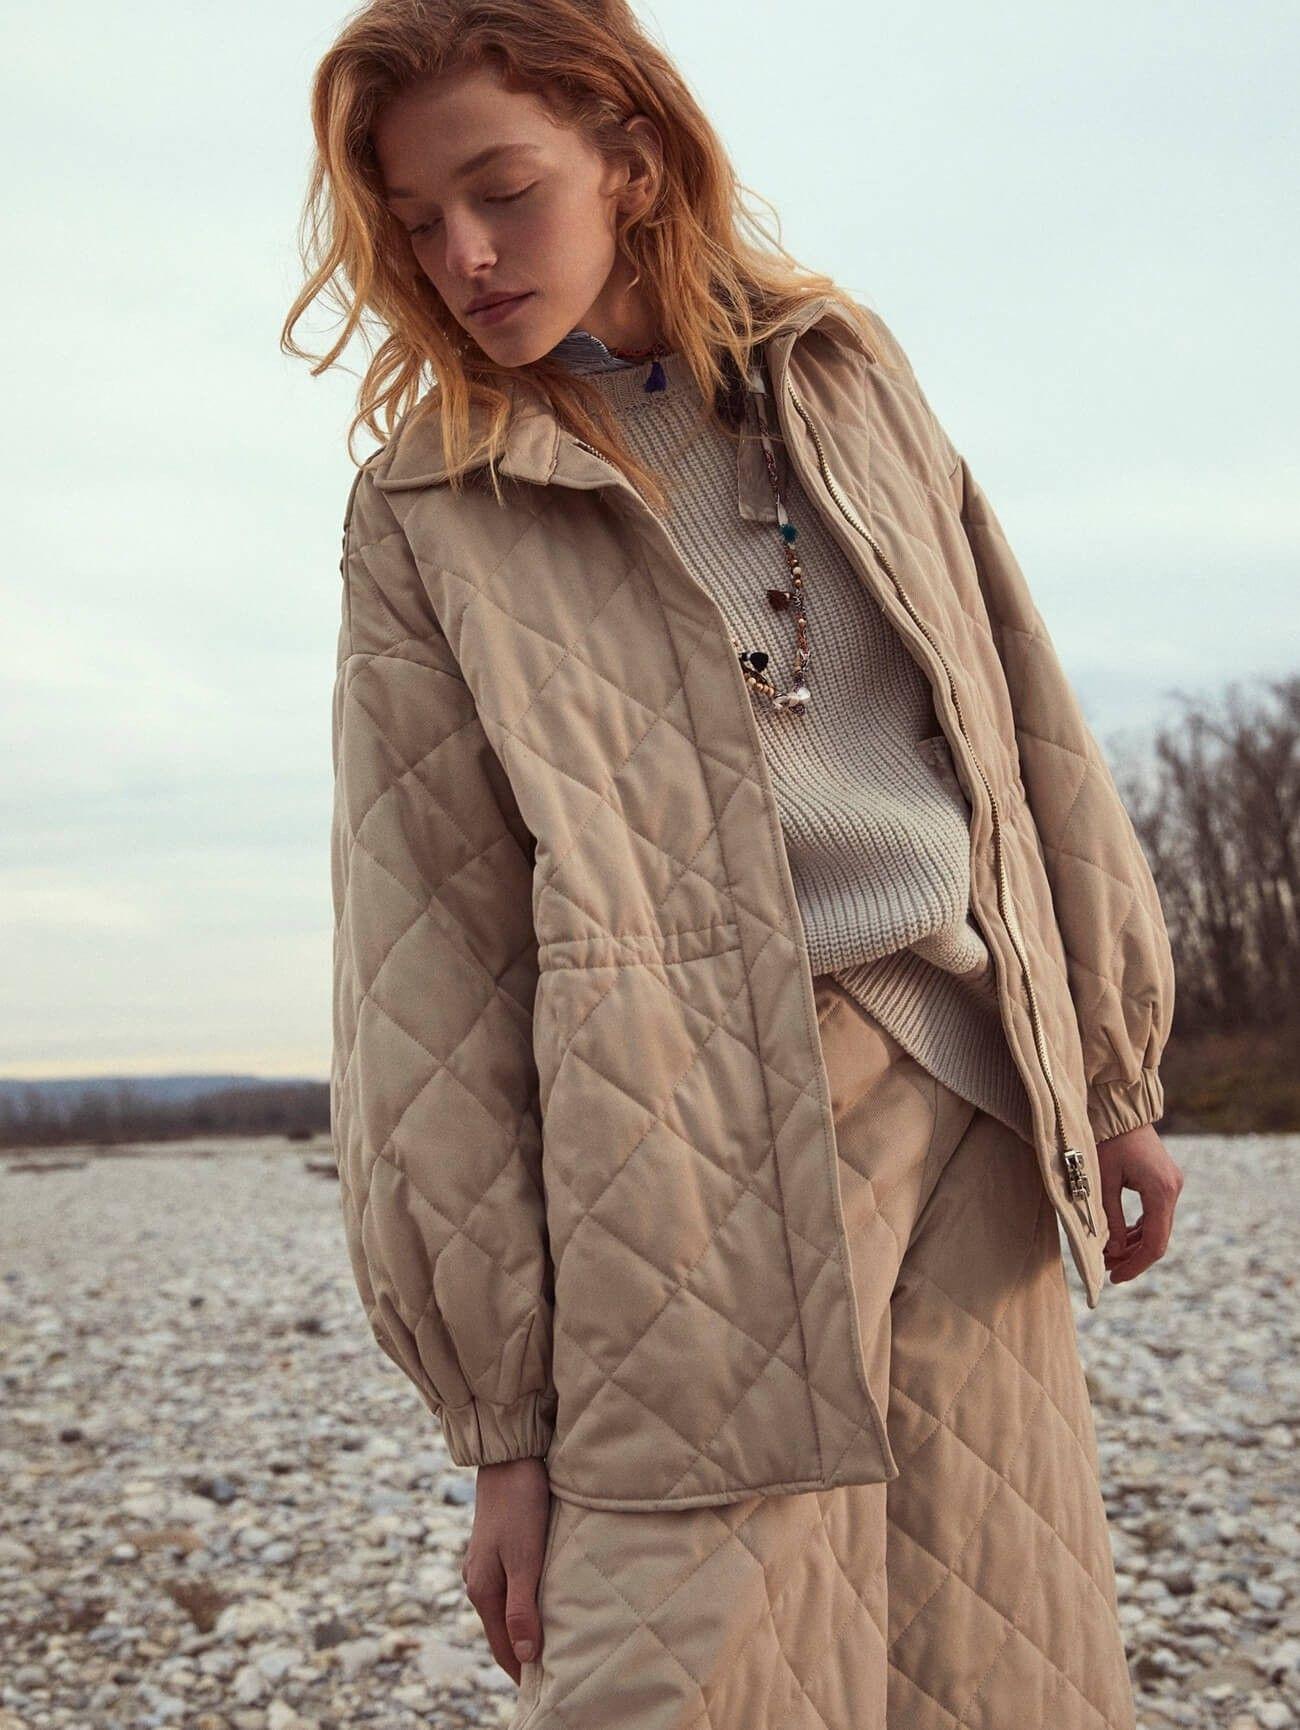 BEATRICE.B - Damen Jacke - Jacket 3809 Fabric Bel 1046 - Sand